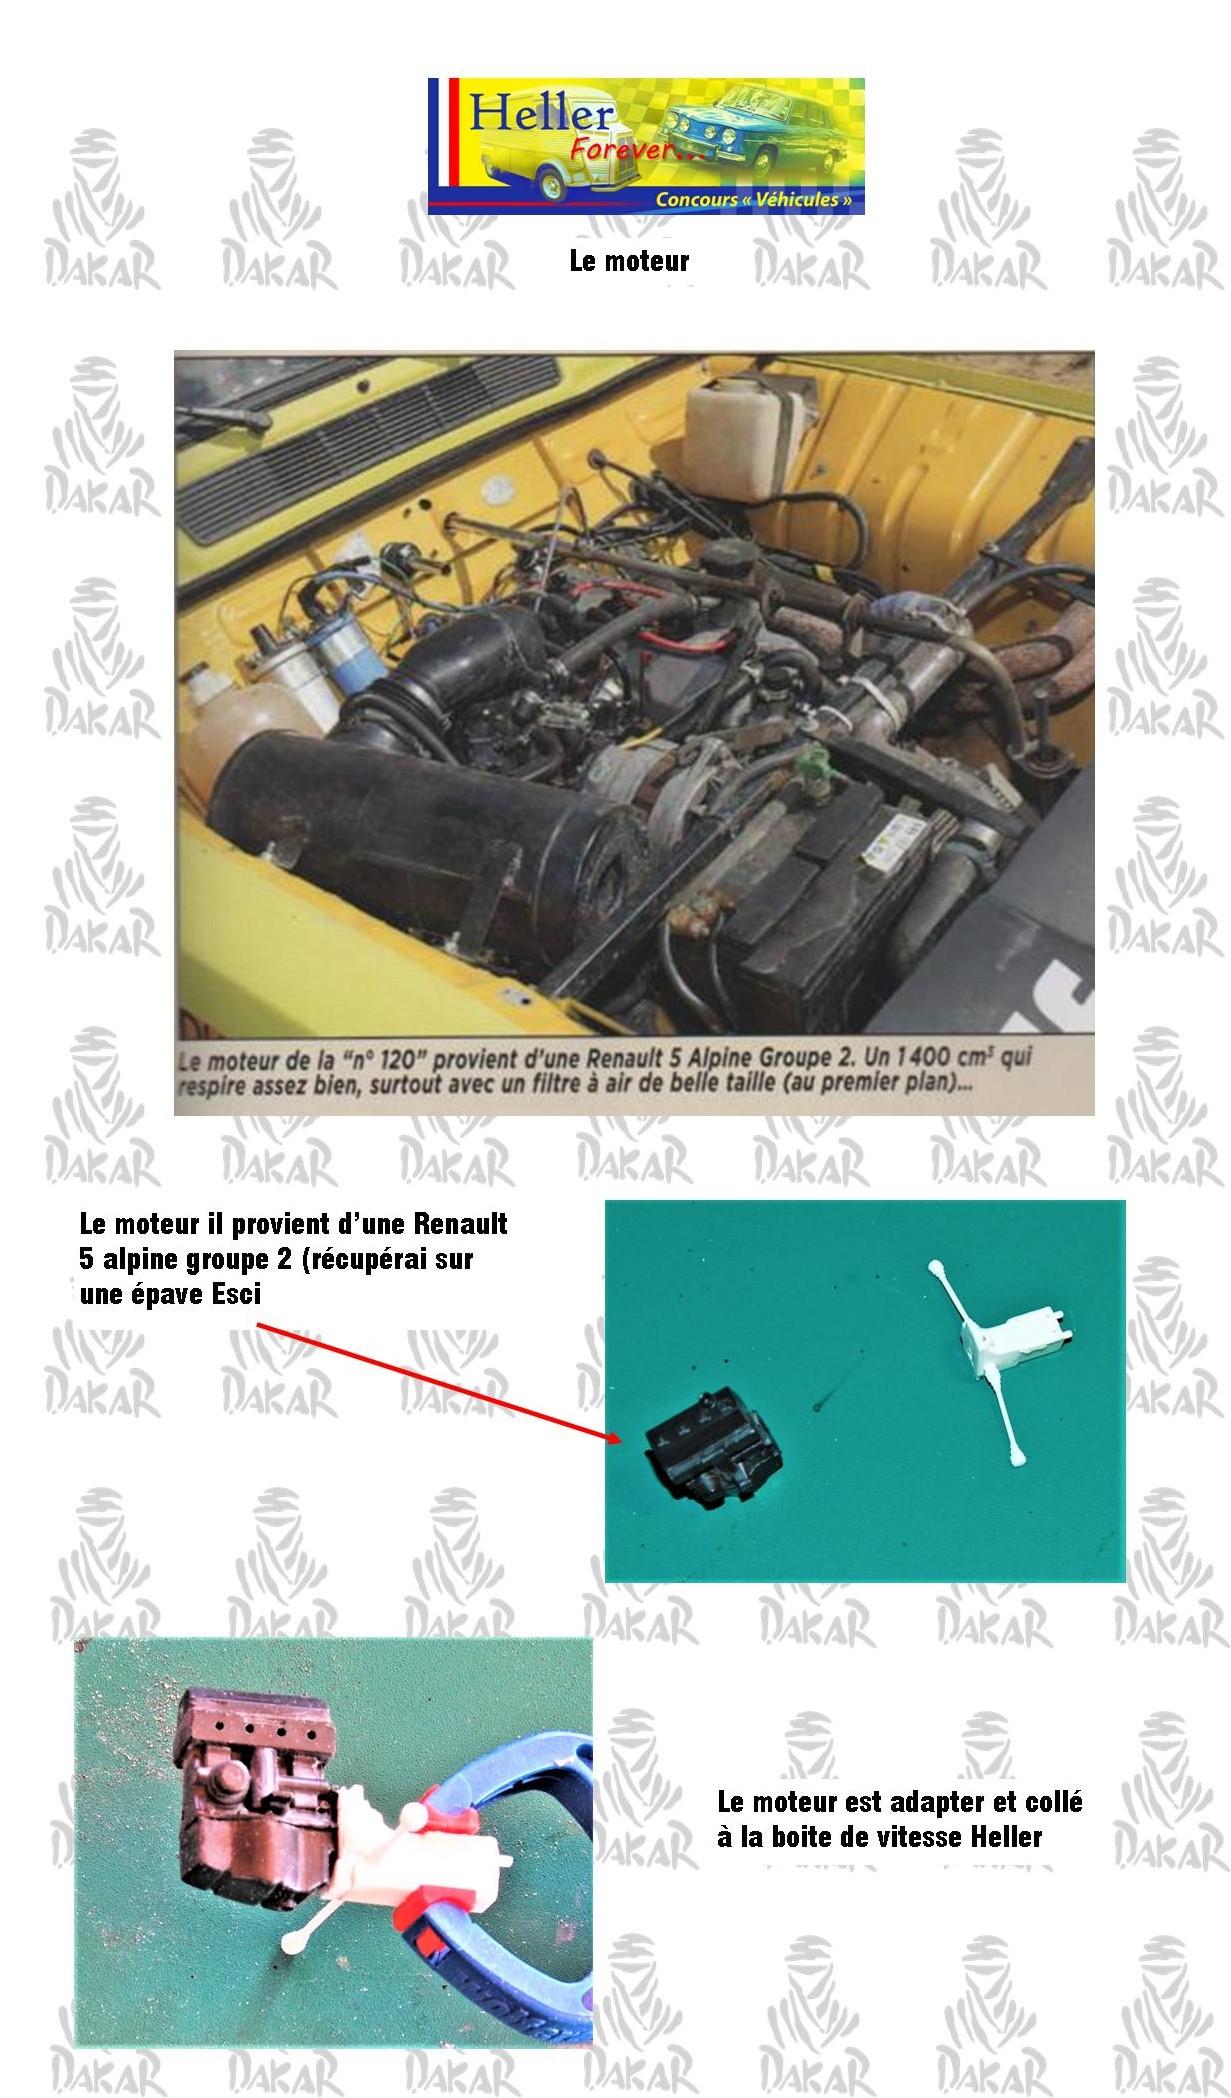 [1/24]Renault 4 l dakar 1980 Ref 80759 1412